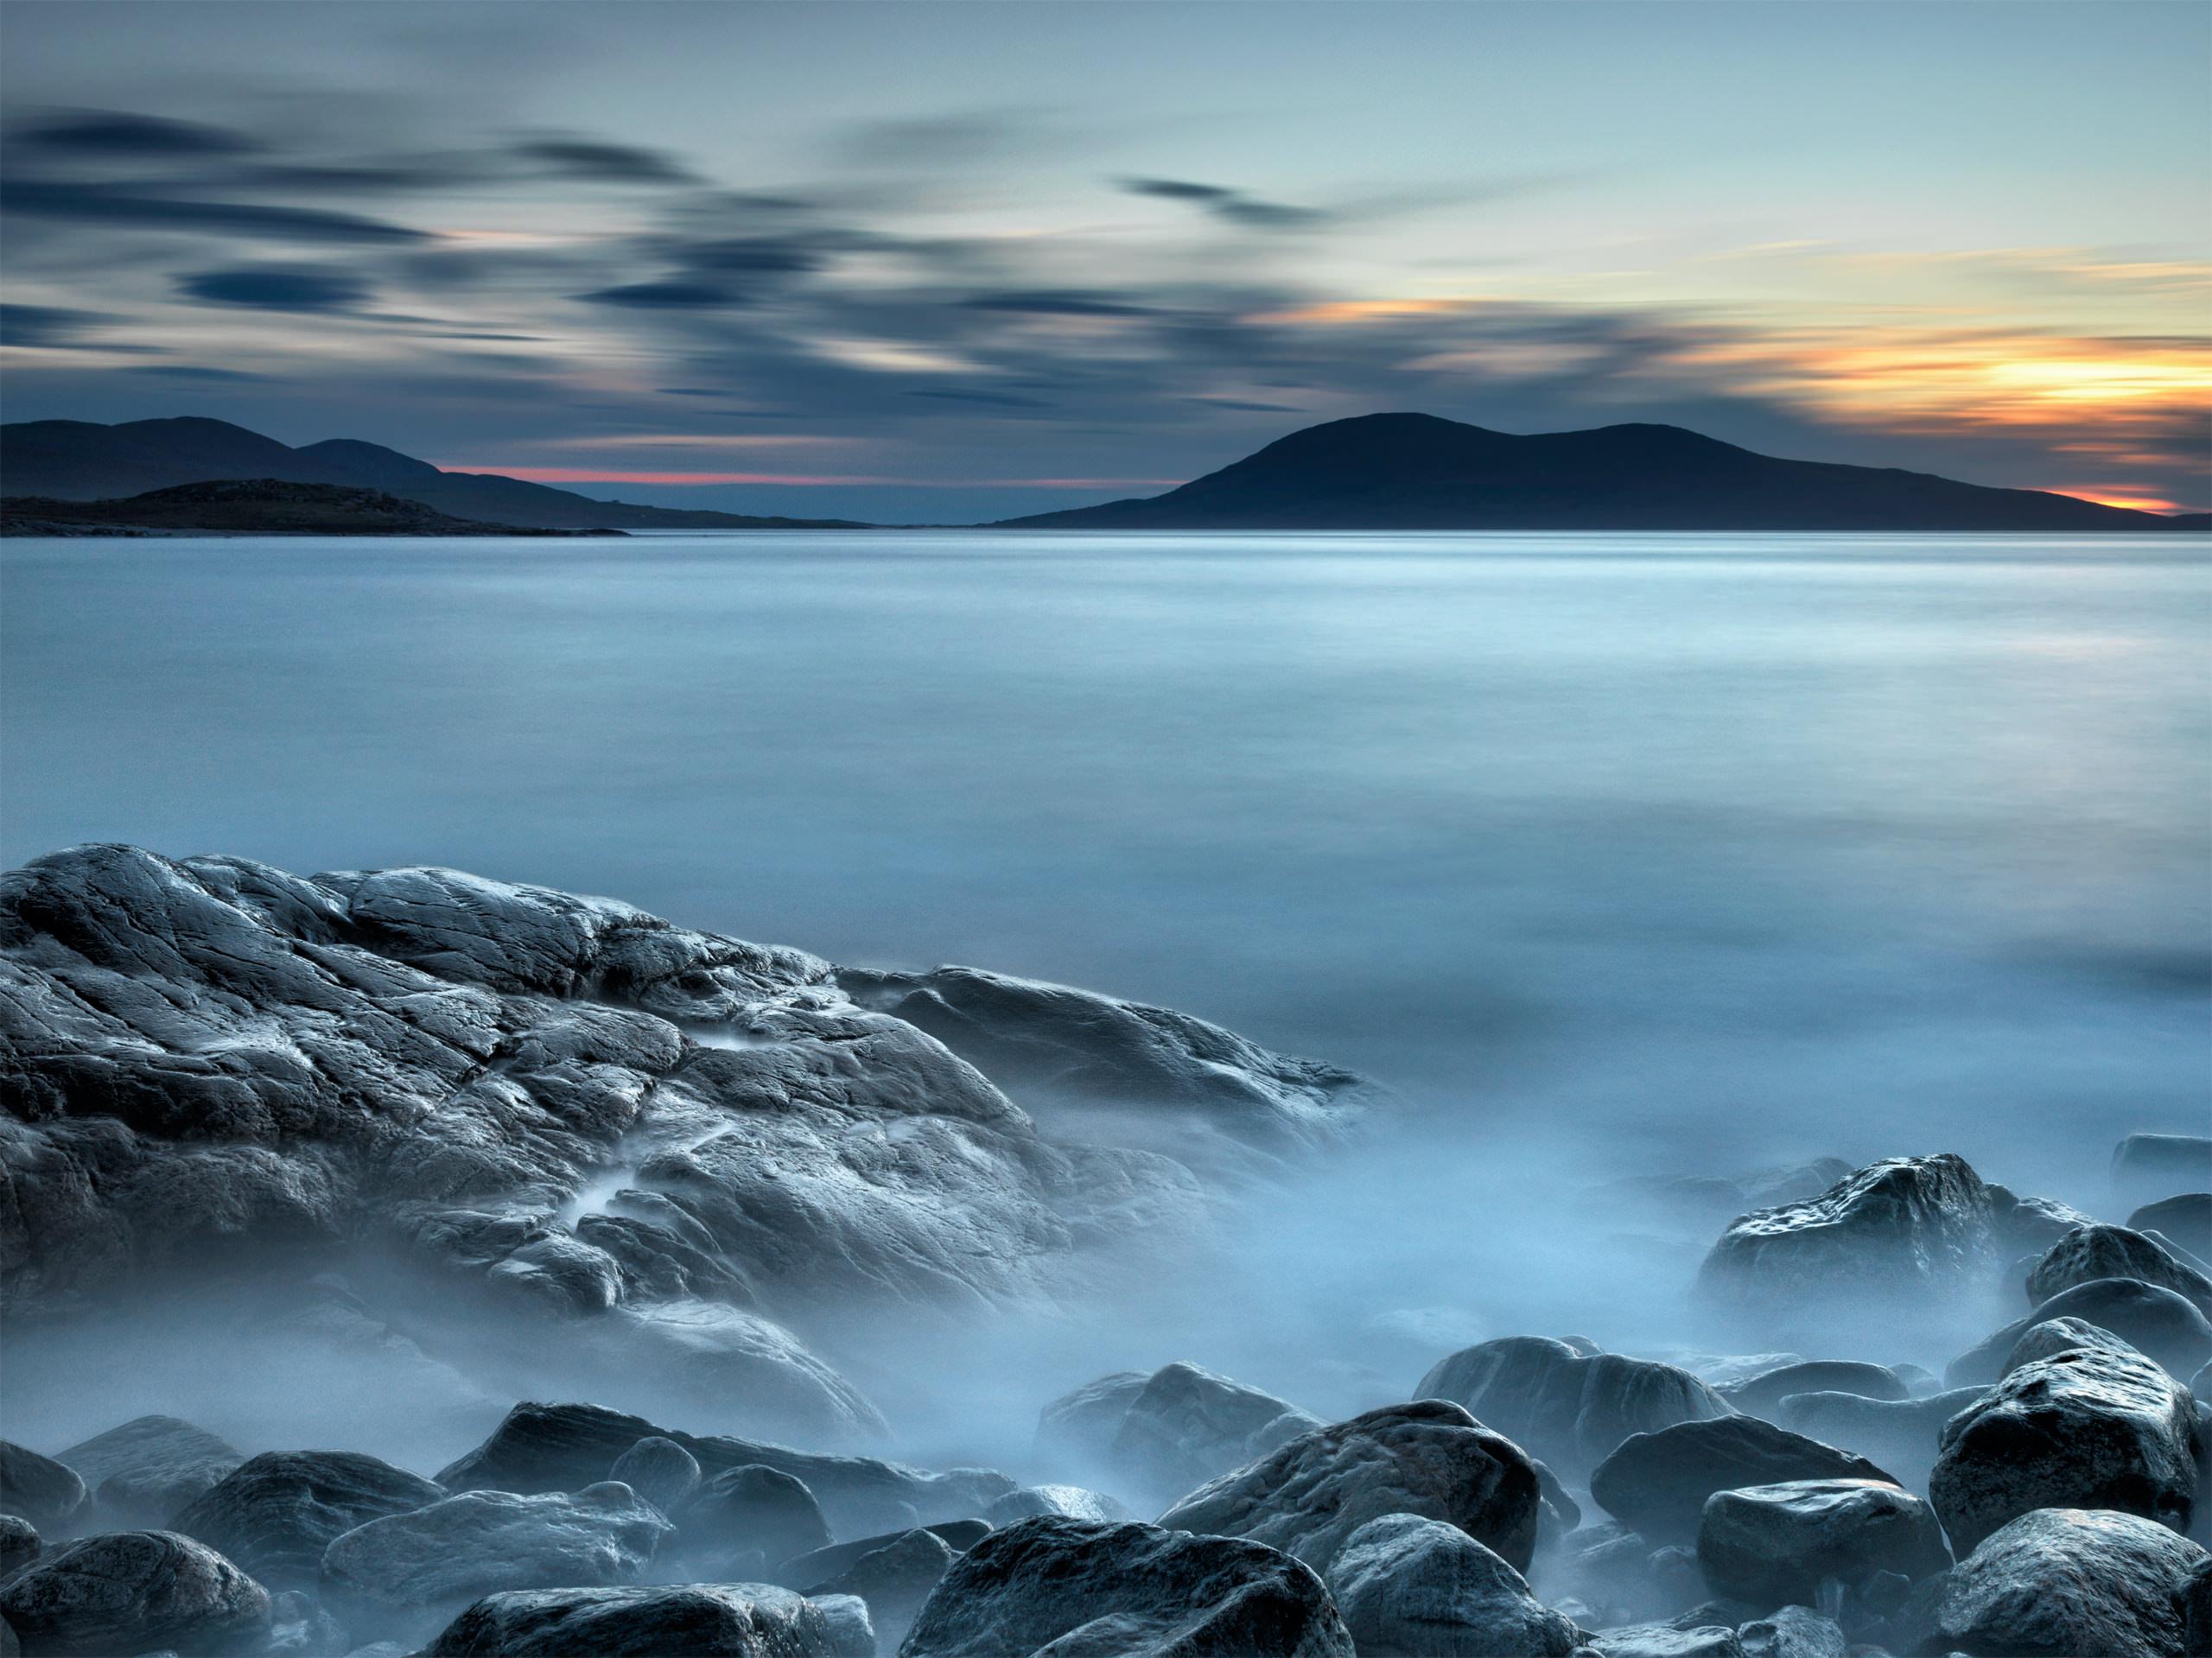 Ian Lawson - Oceans Art